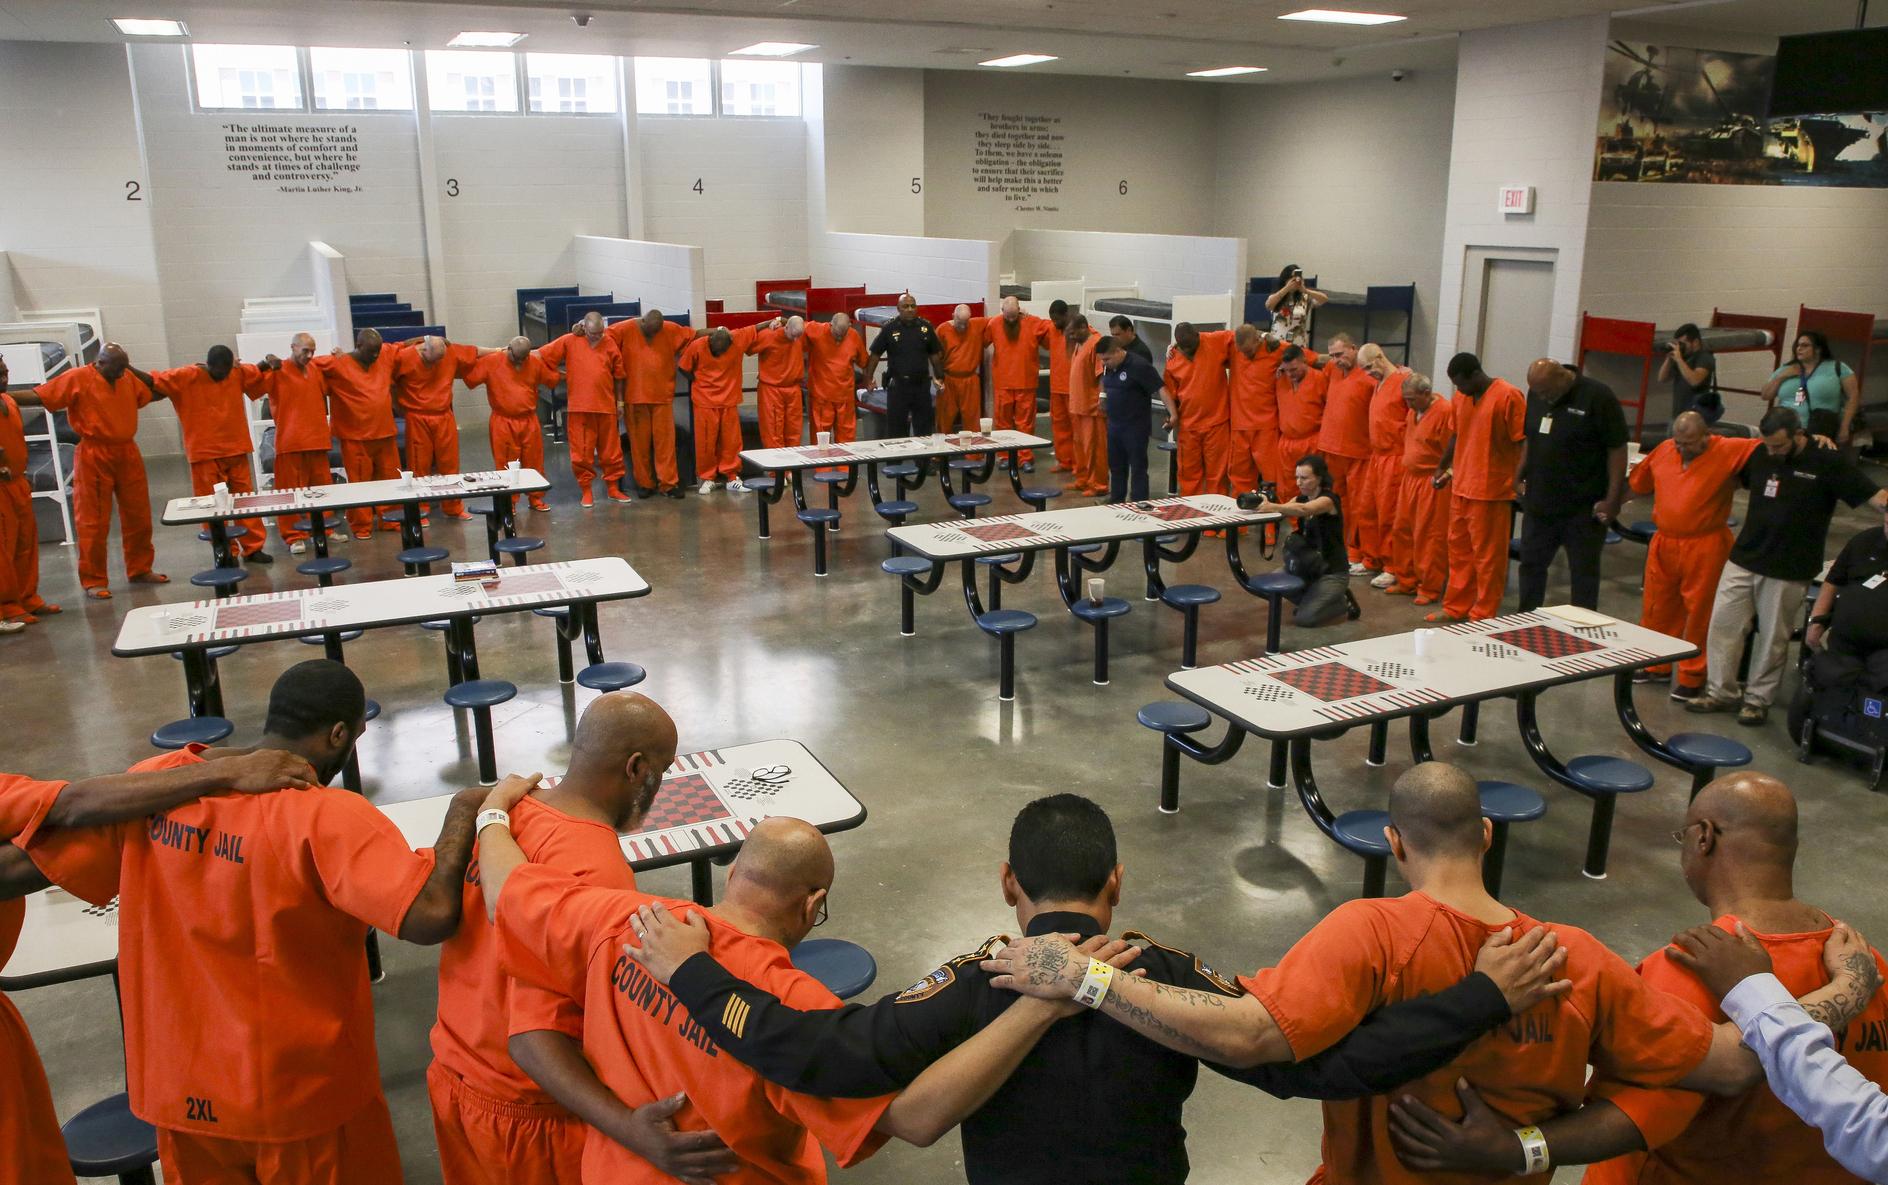 , Texas Jails Were Freezing and Smelled Like Urine, Saubio Making Wealth